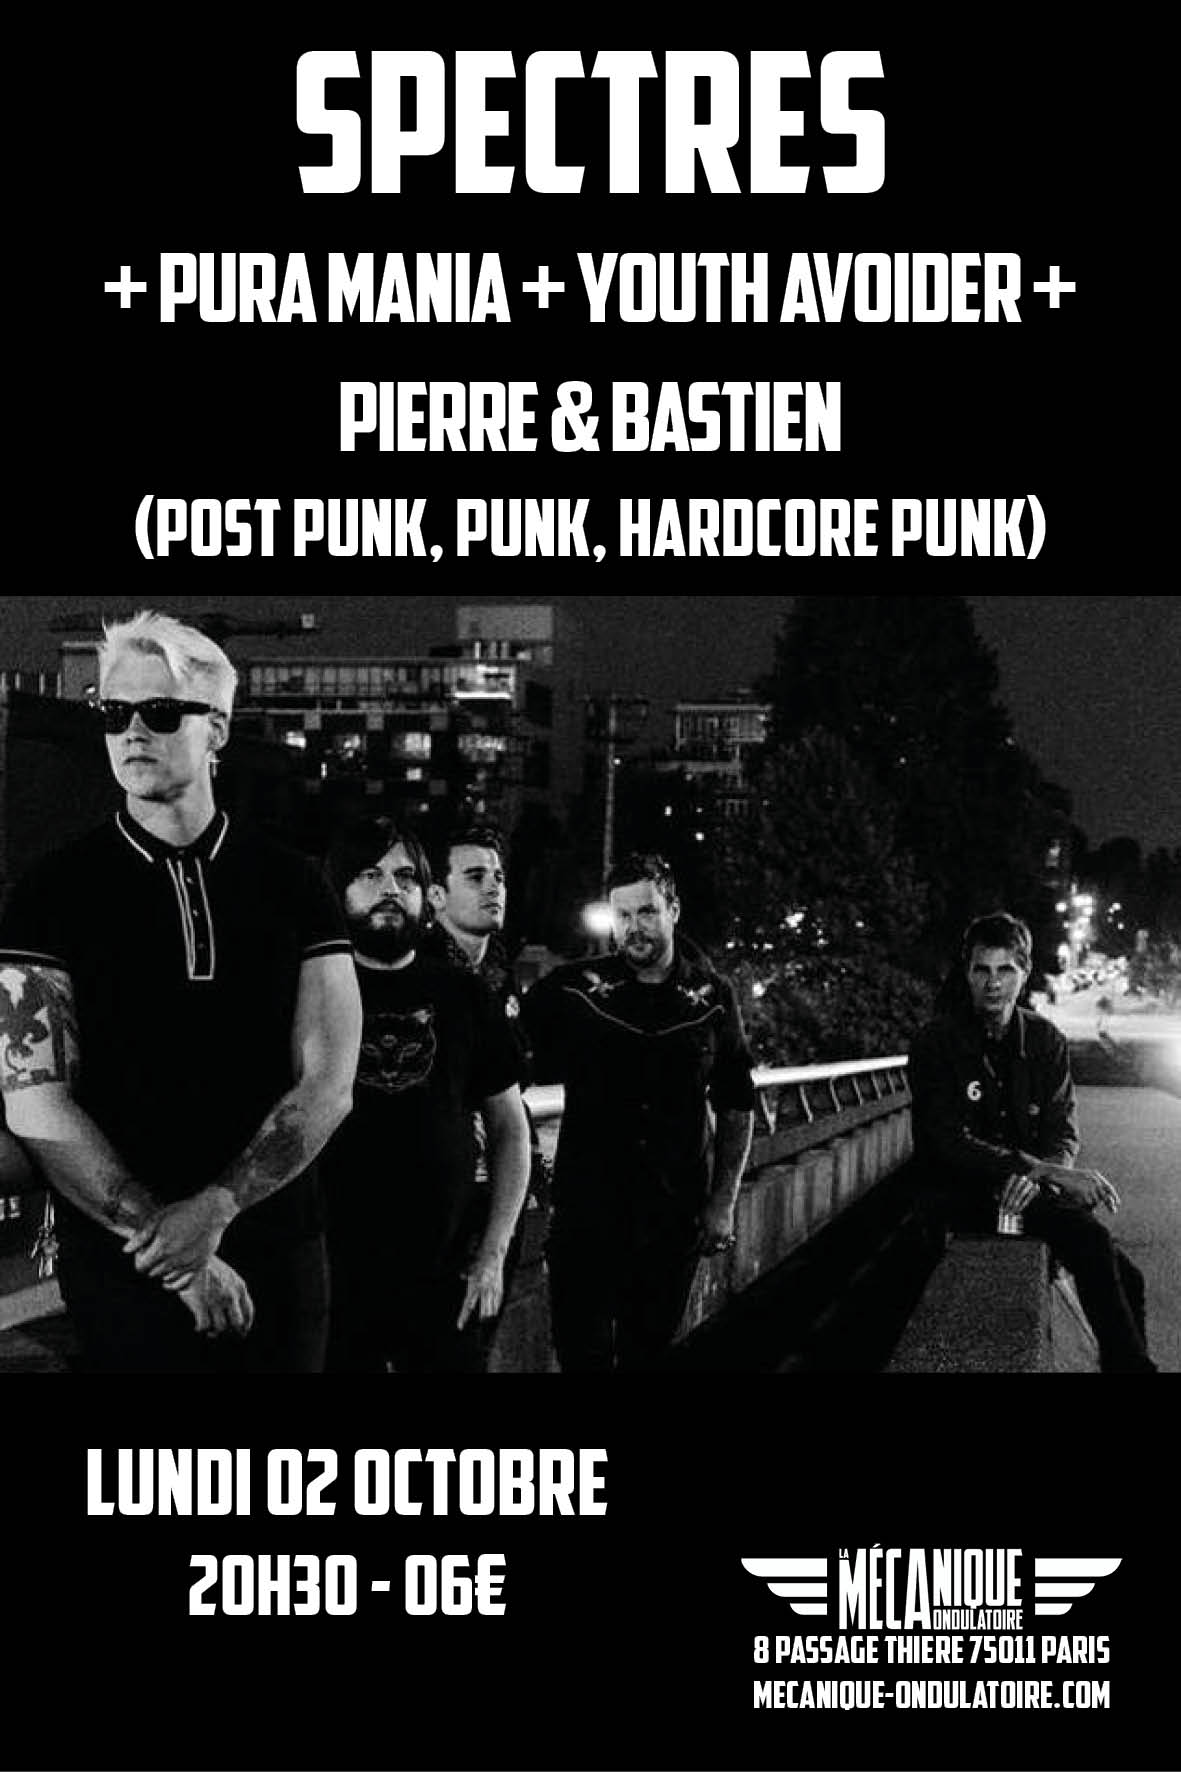 Spectres + Pura Mania + Youth AVoider + Pierre & Bastien // 02.10